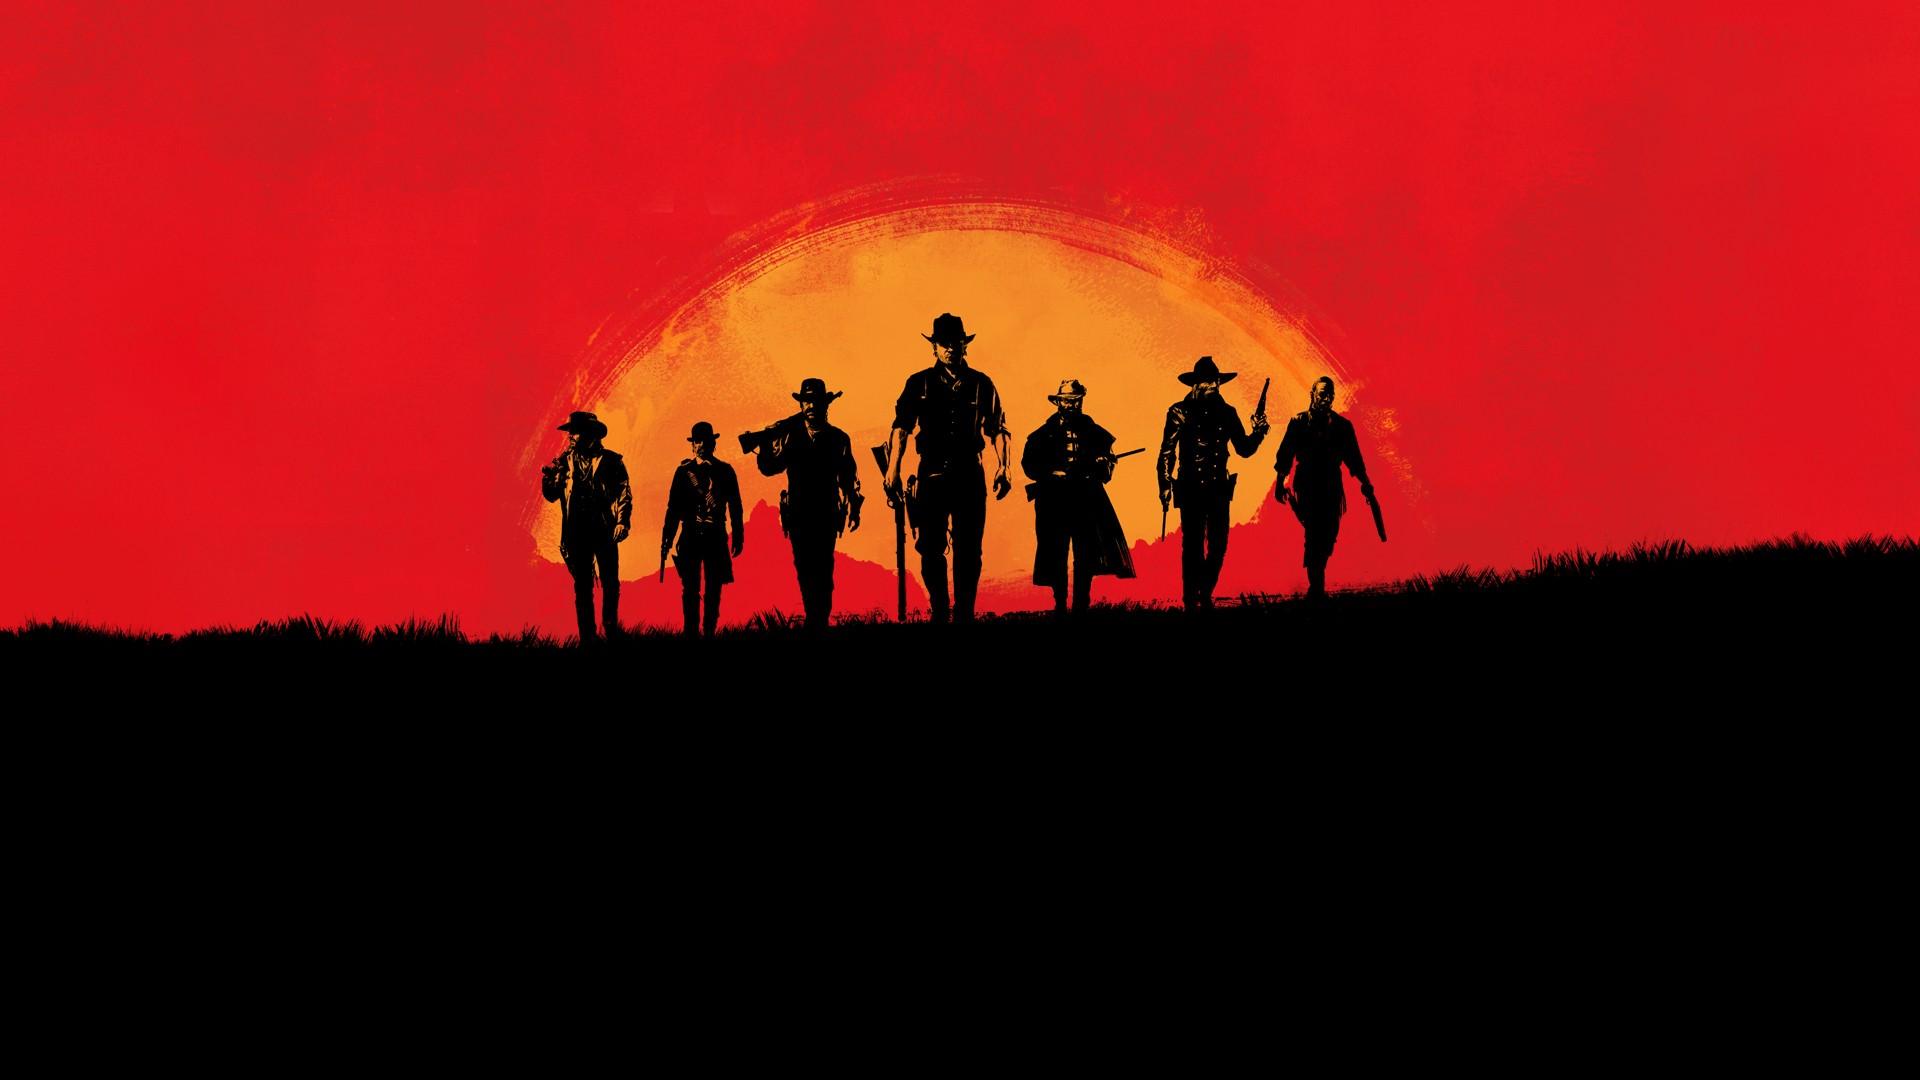 Wallpaper Video Games Sunset Red Sky Silhouette Sunrise